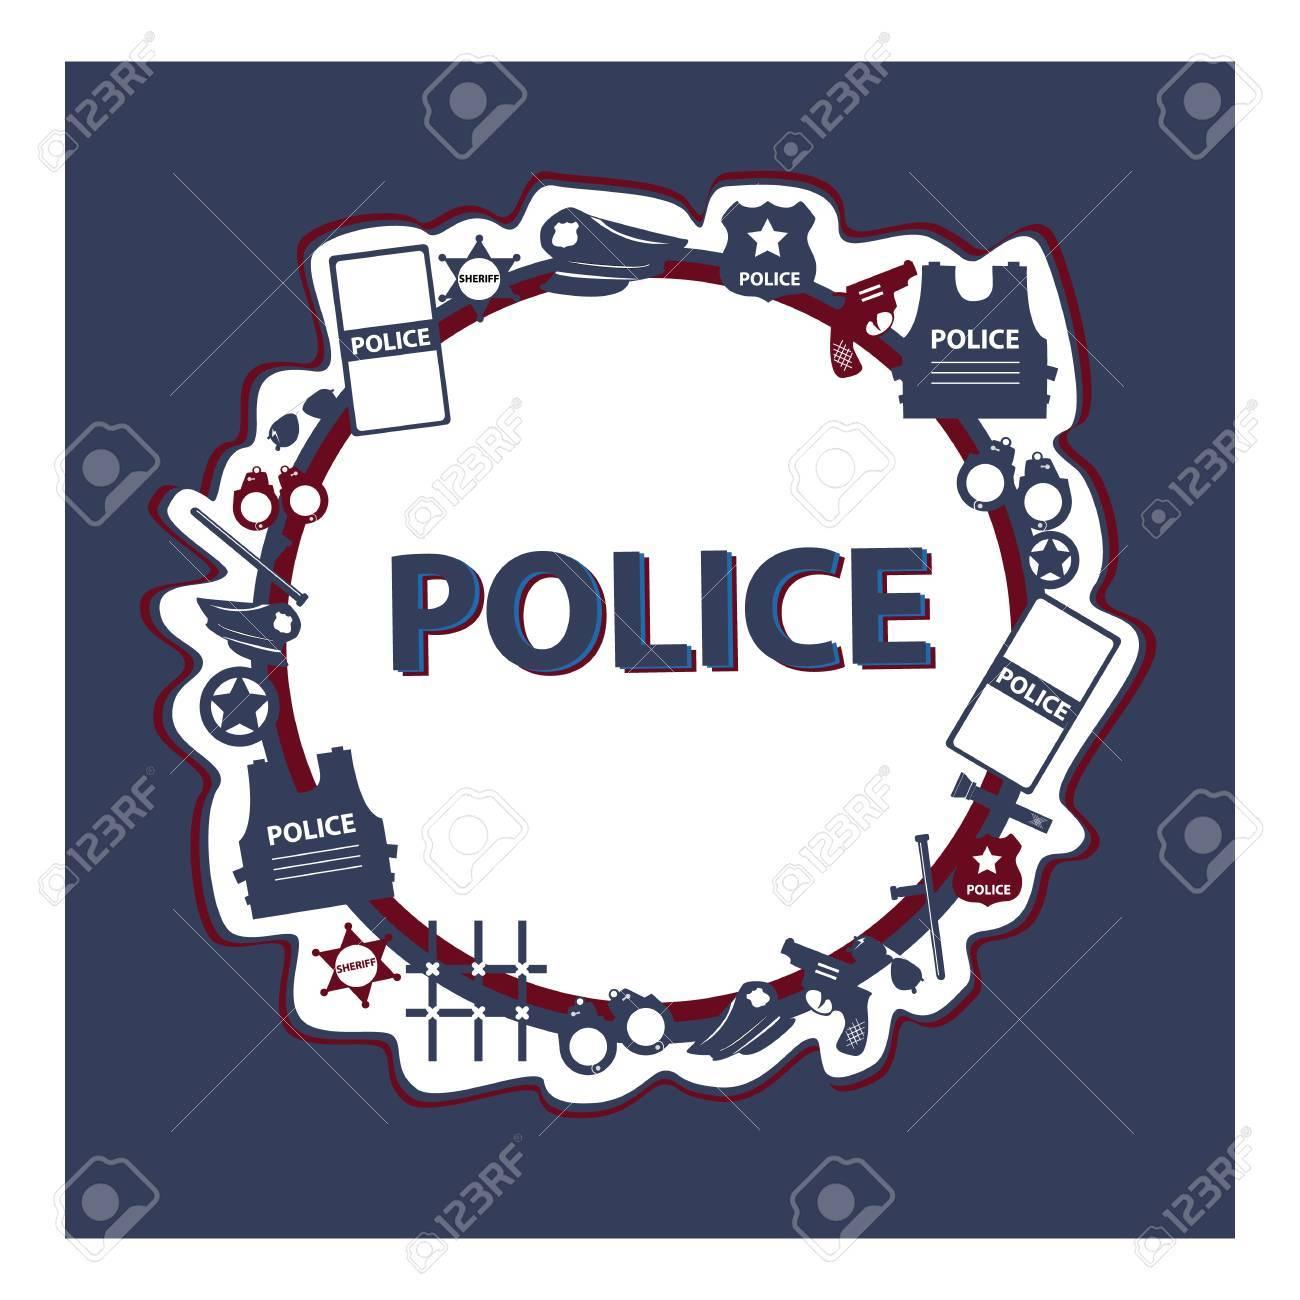 Vector Concept Design Police Symbols In Round Form With Dark